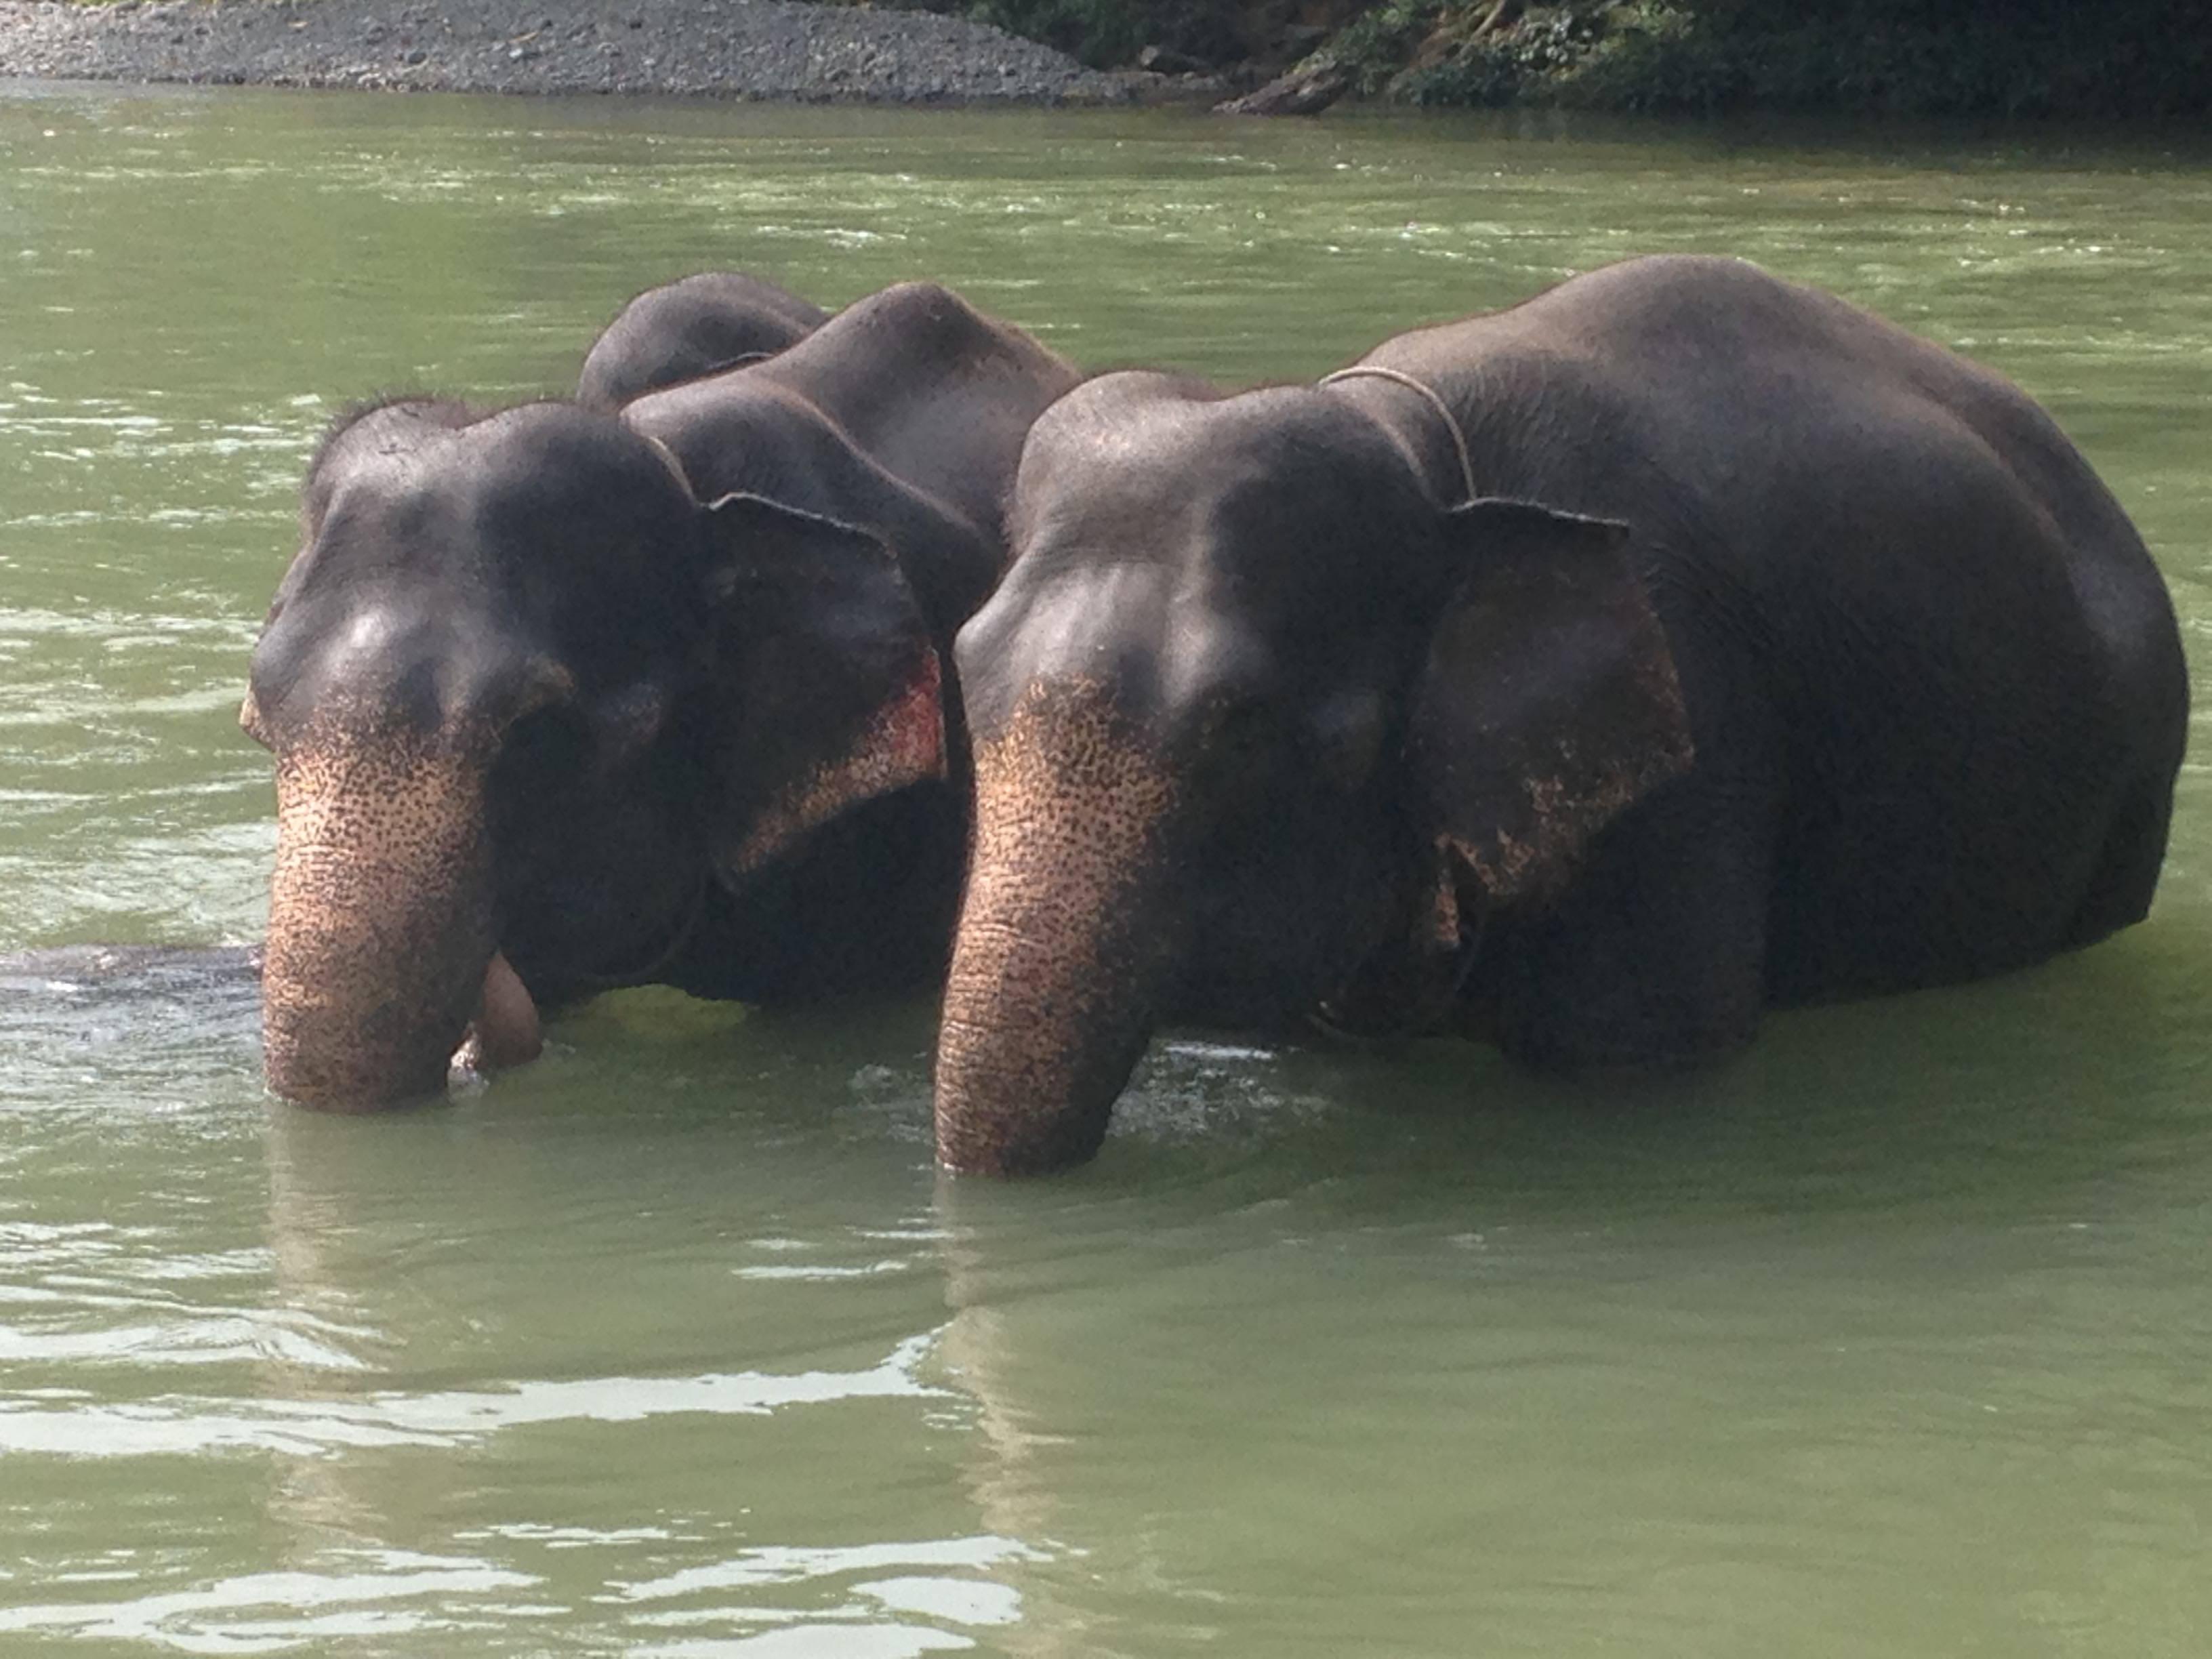 Tangkahan Elephant Sanctuary